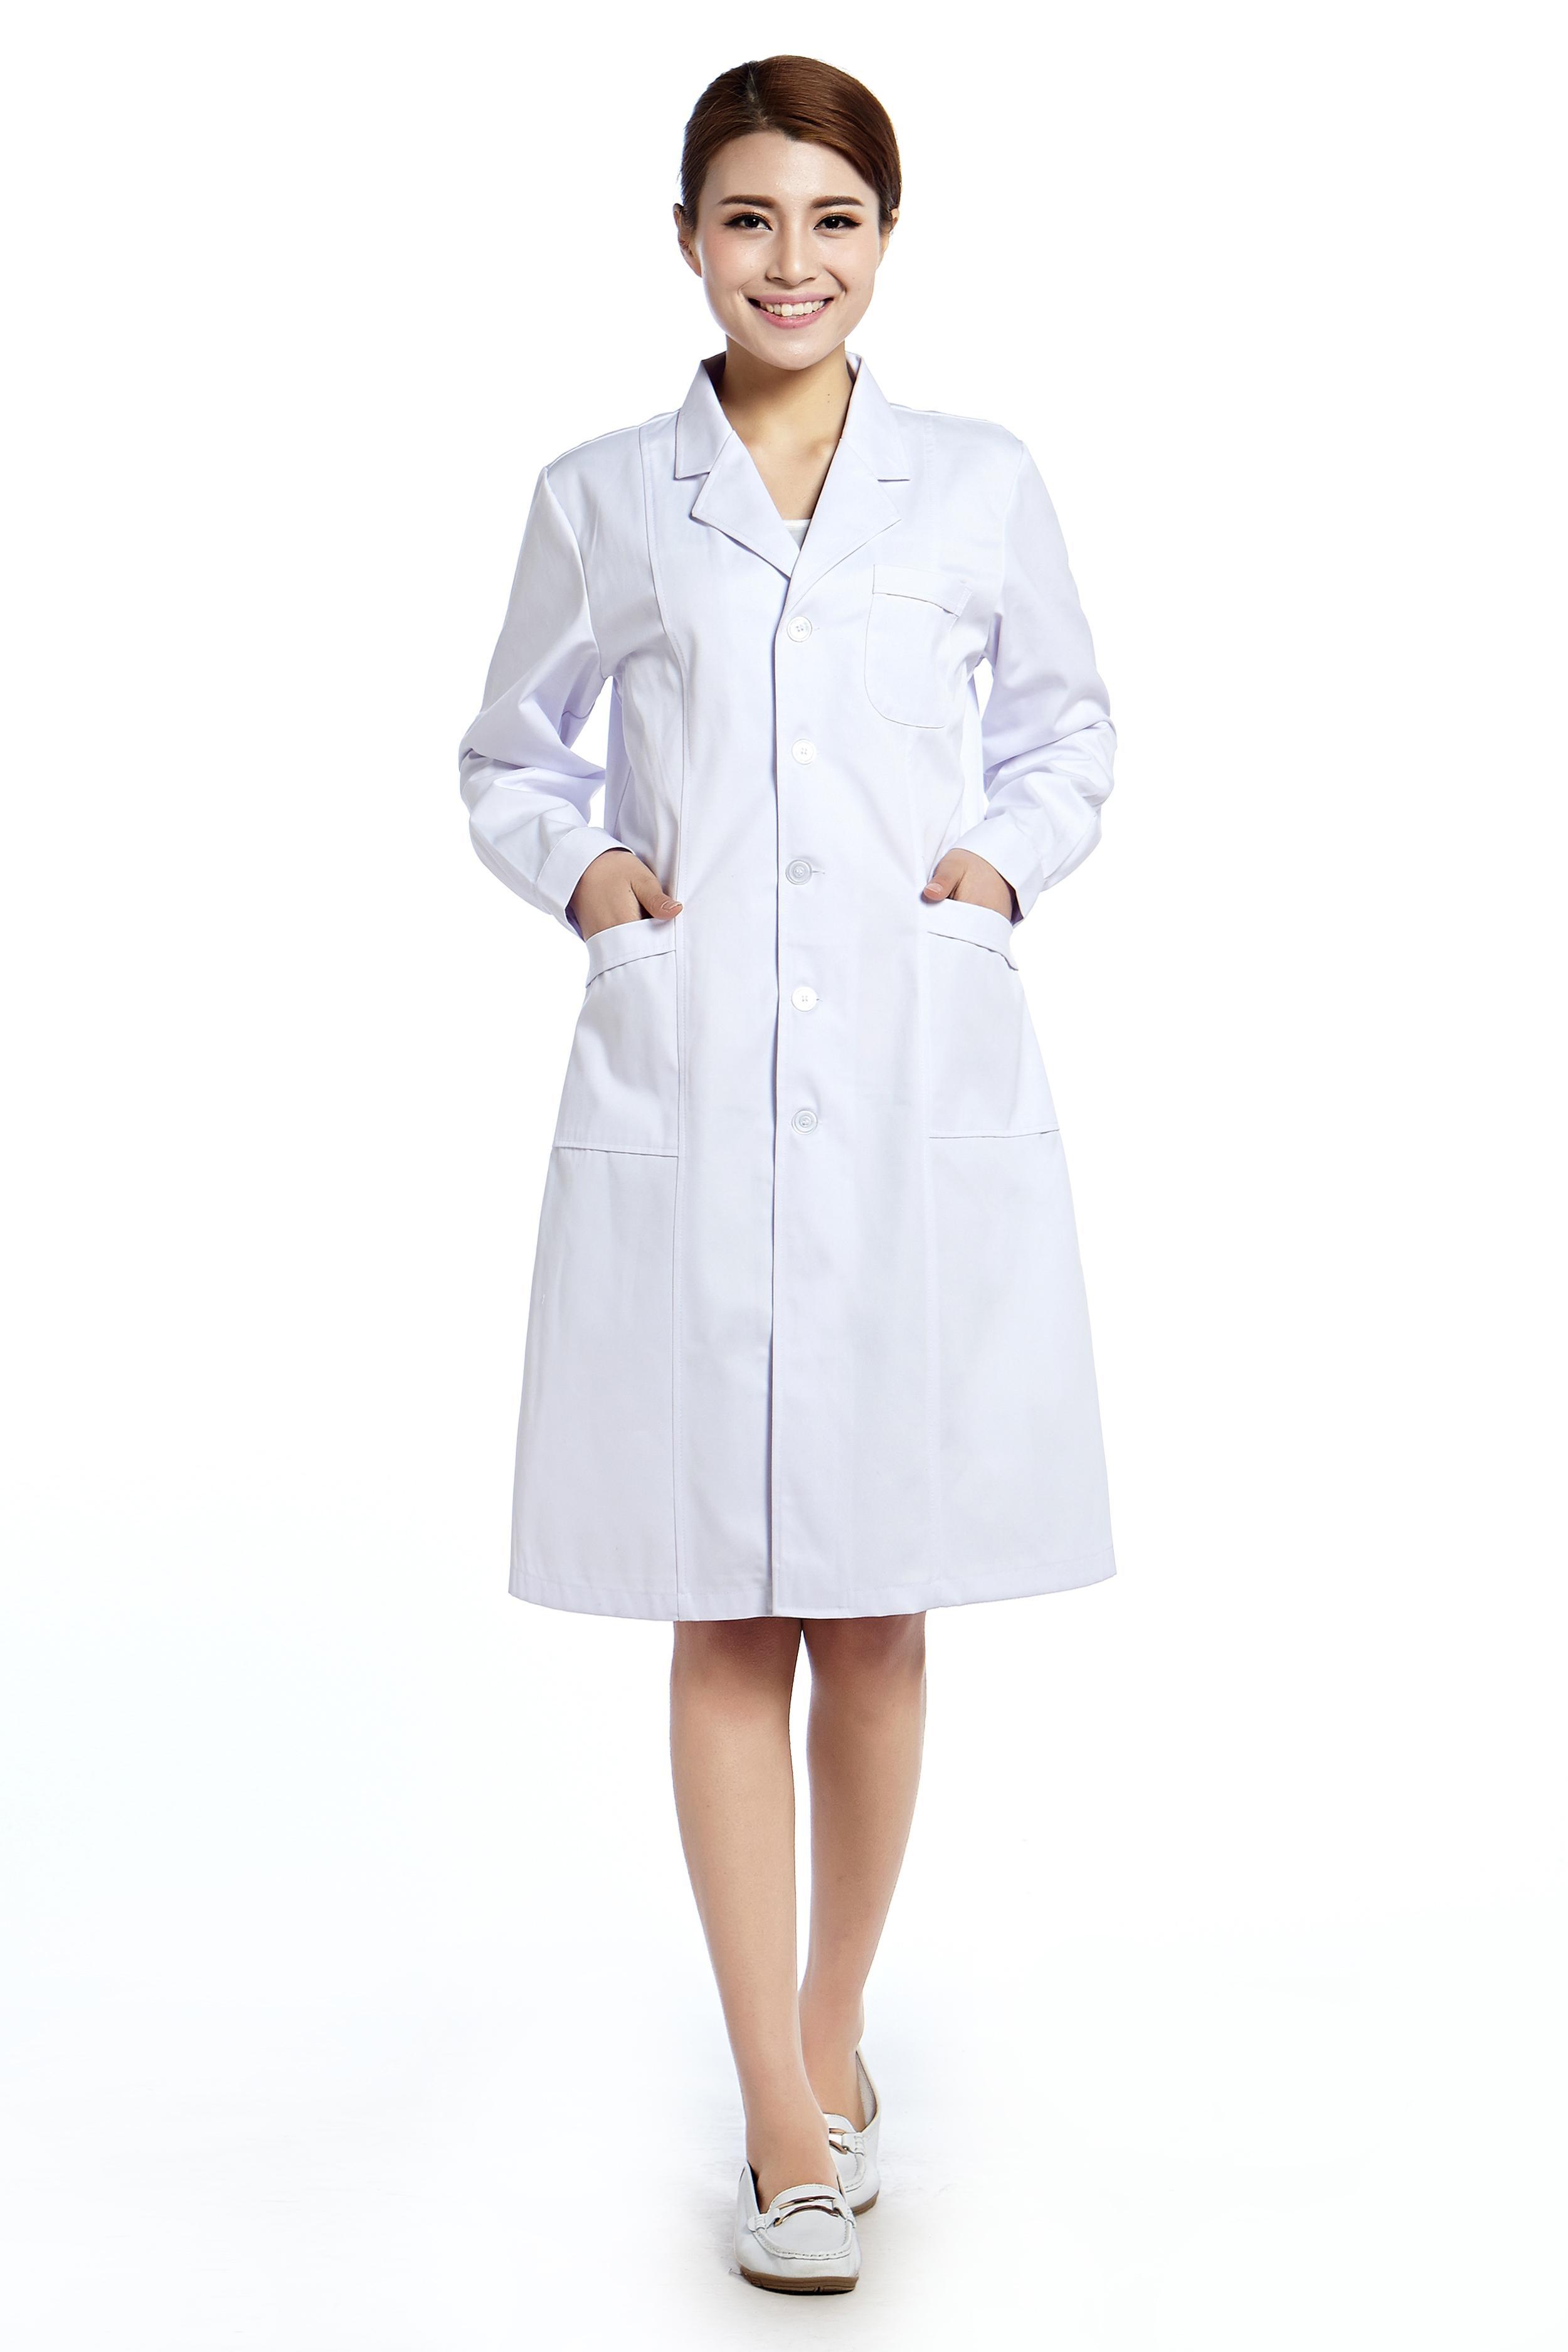 White Coat Store